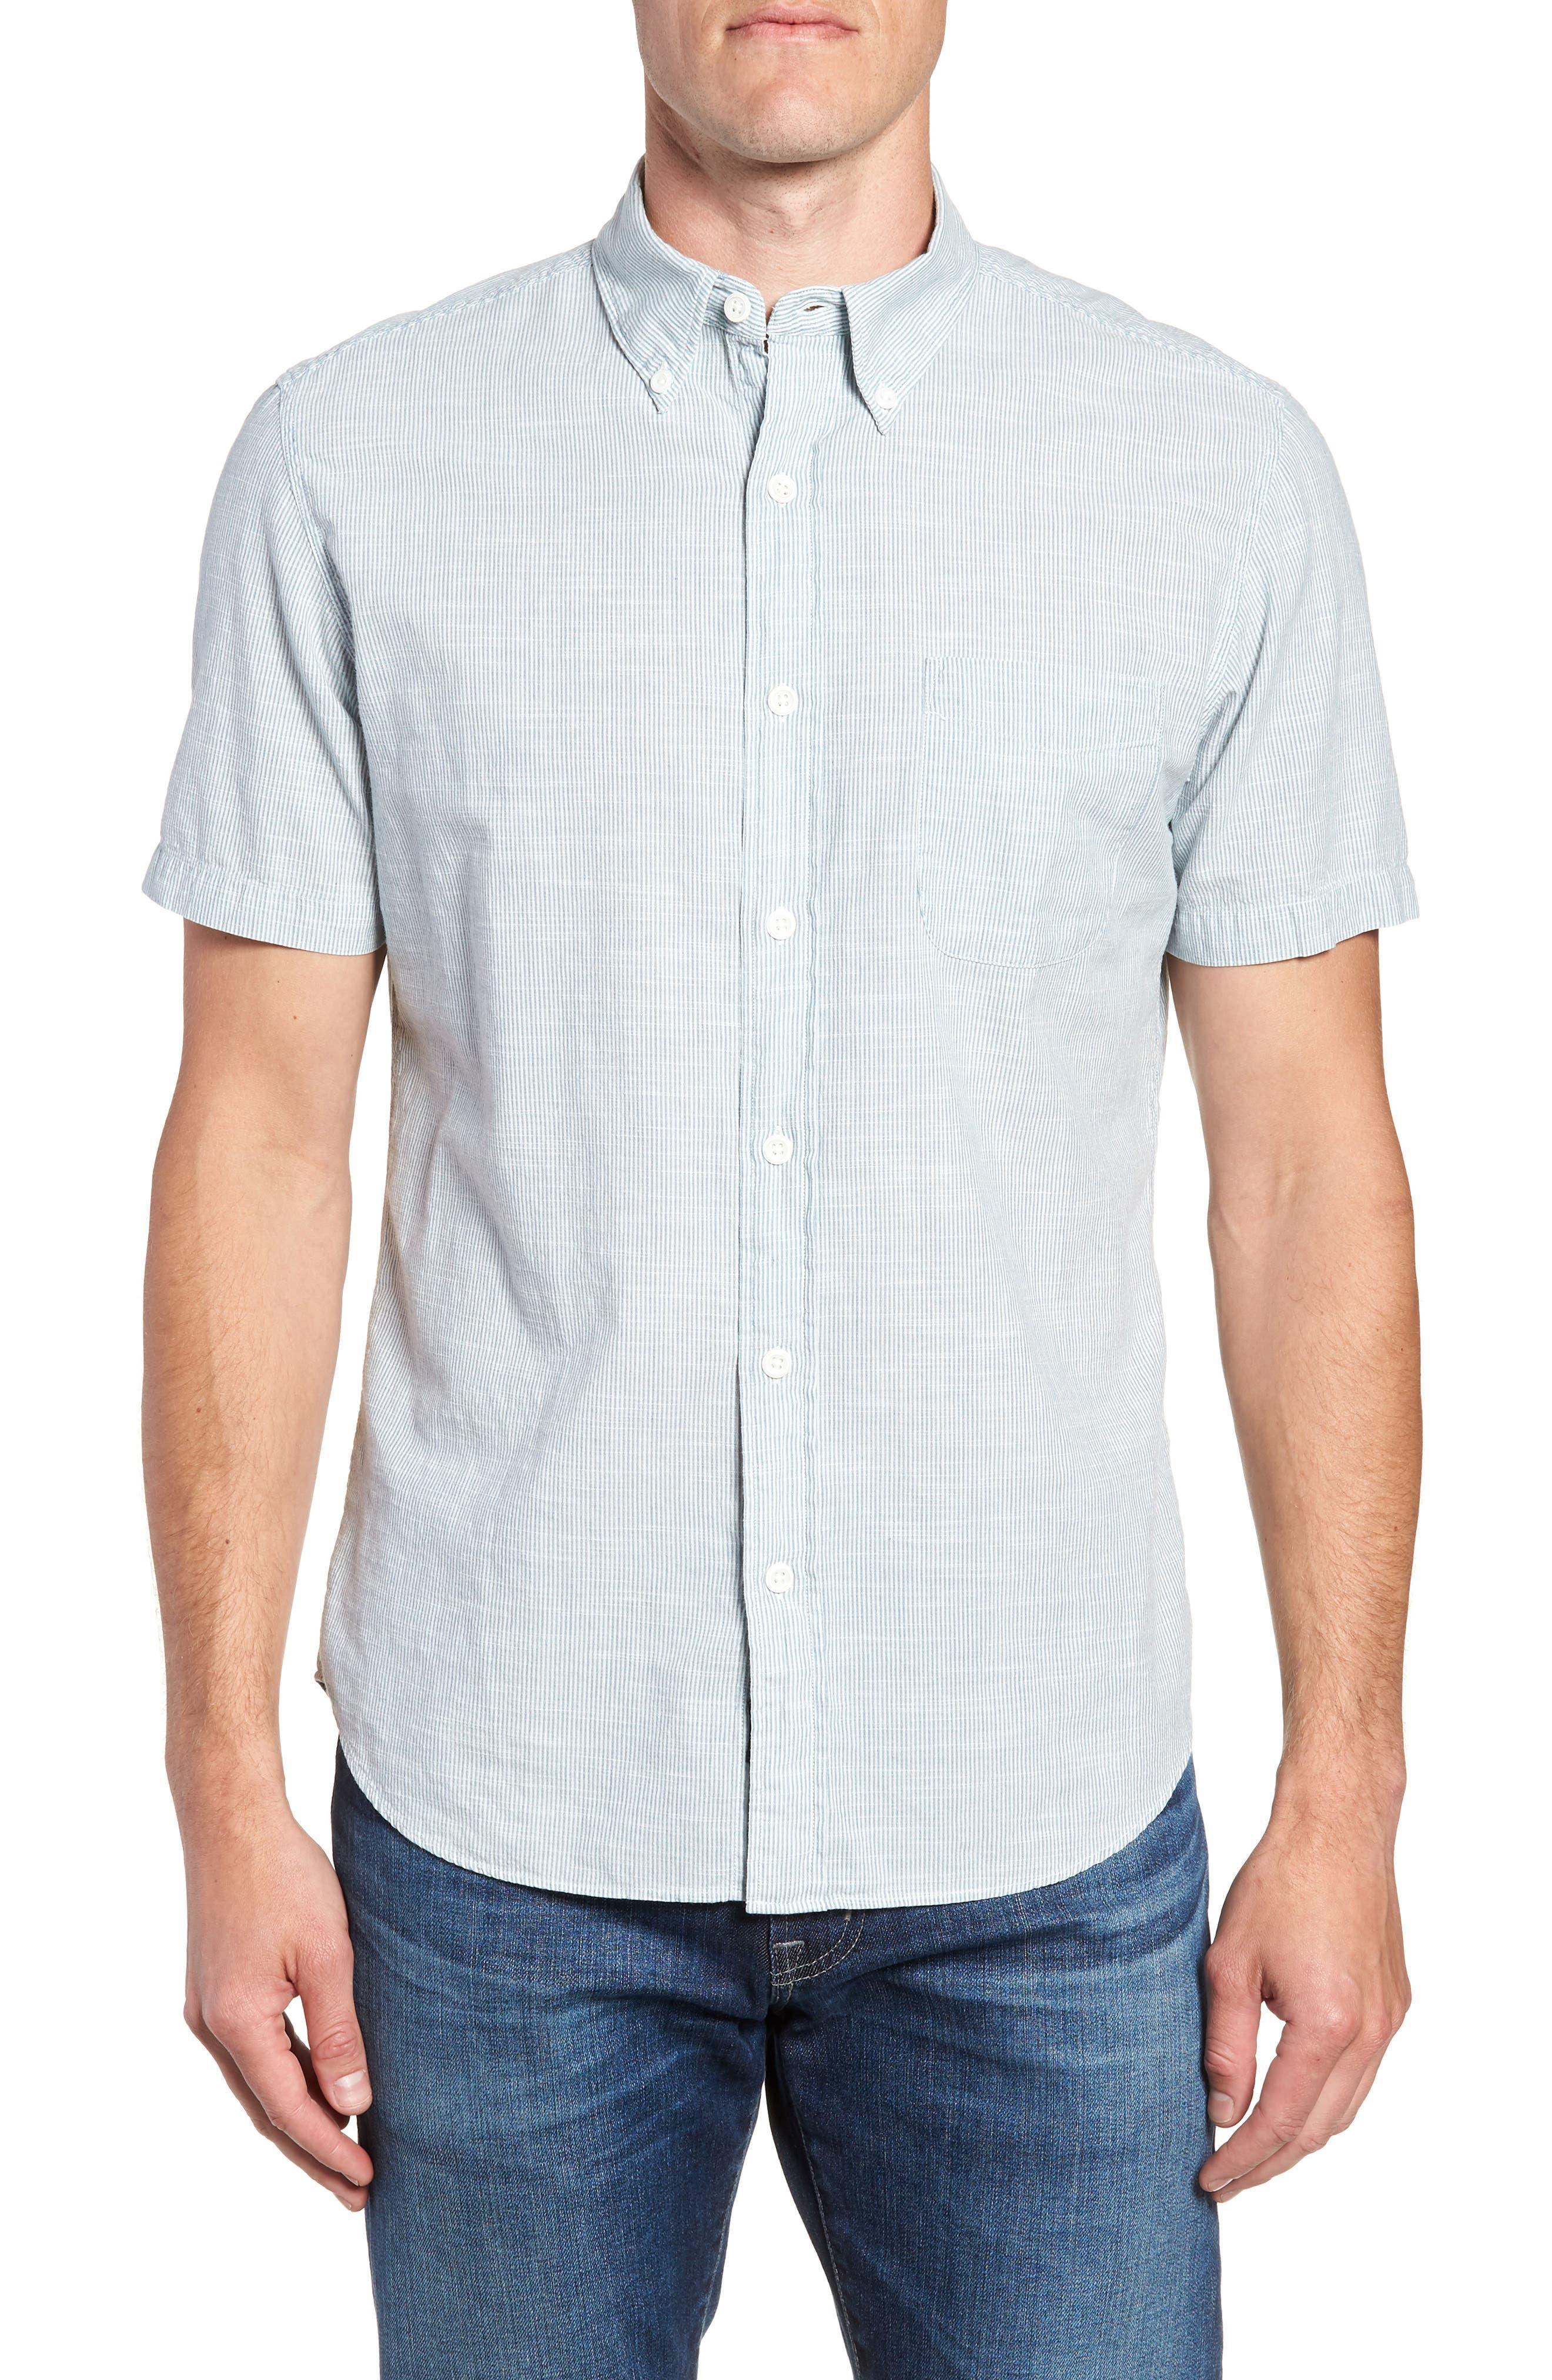 Pacific Pinstripe Sport Shirt,                             Main thumbnail 1, color,                             100